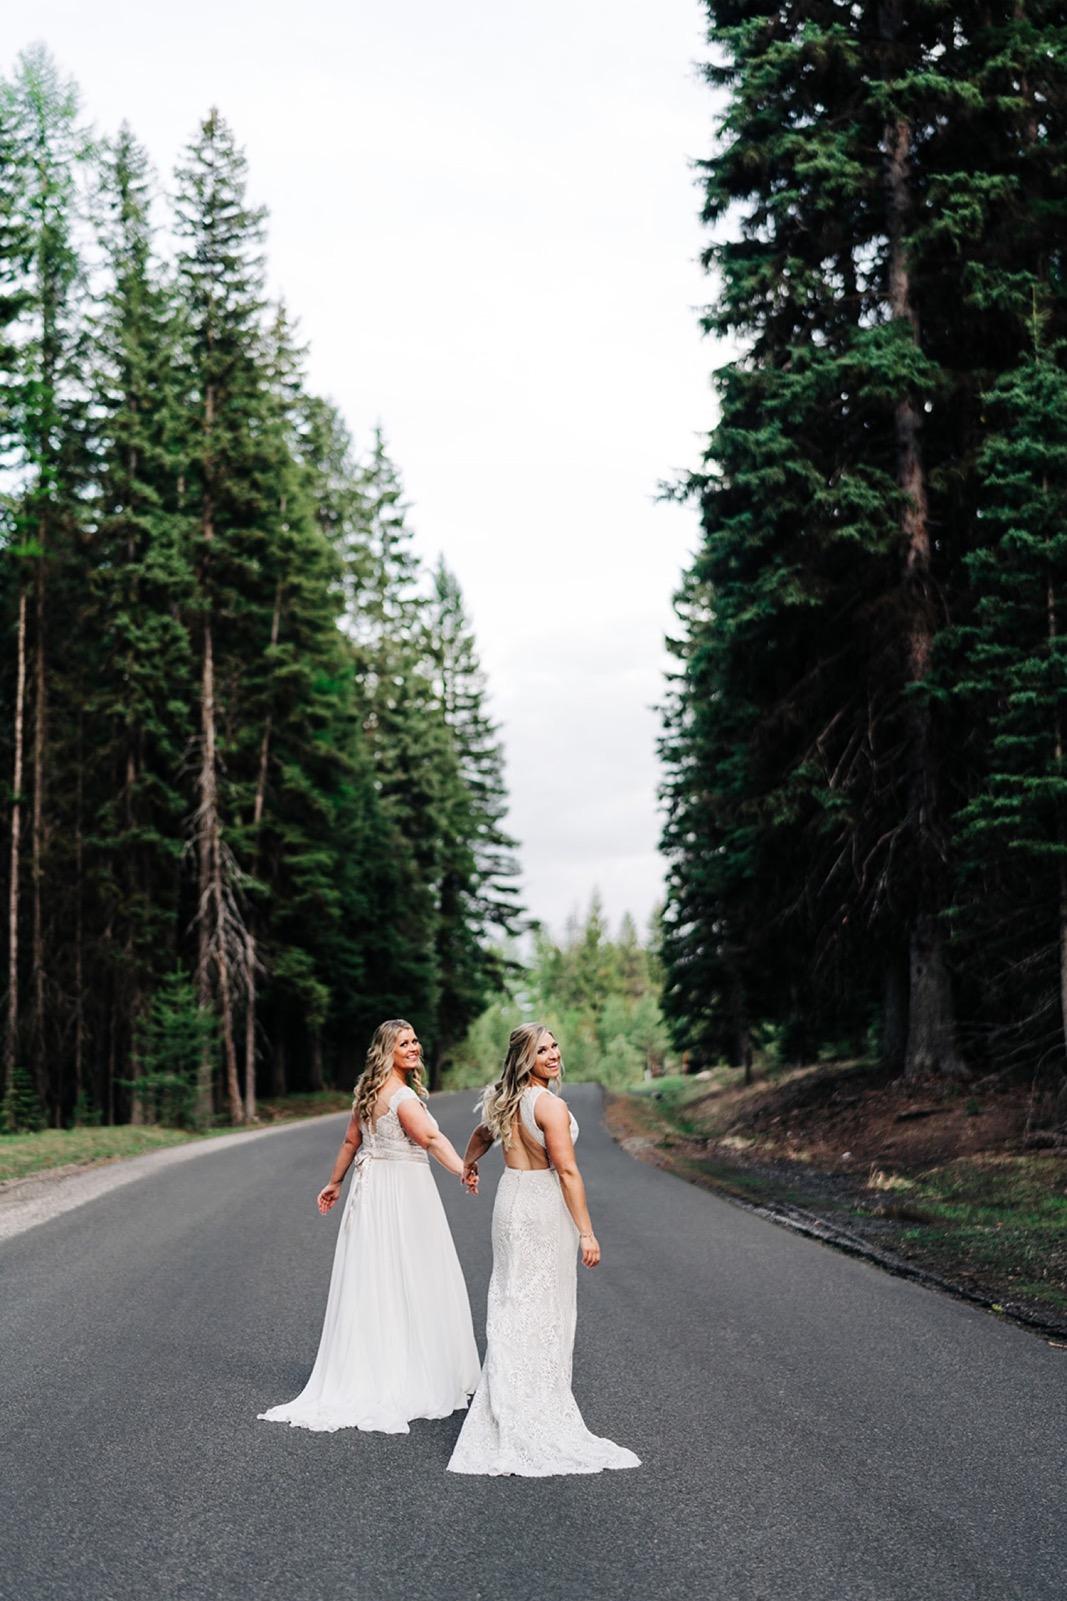 200_falissa_heather_wedding-563.jpg